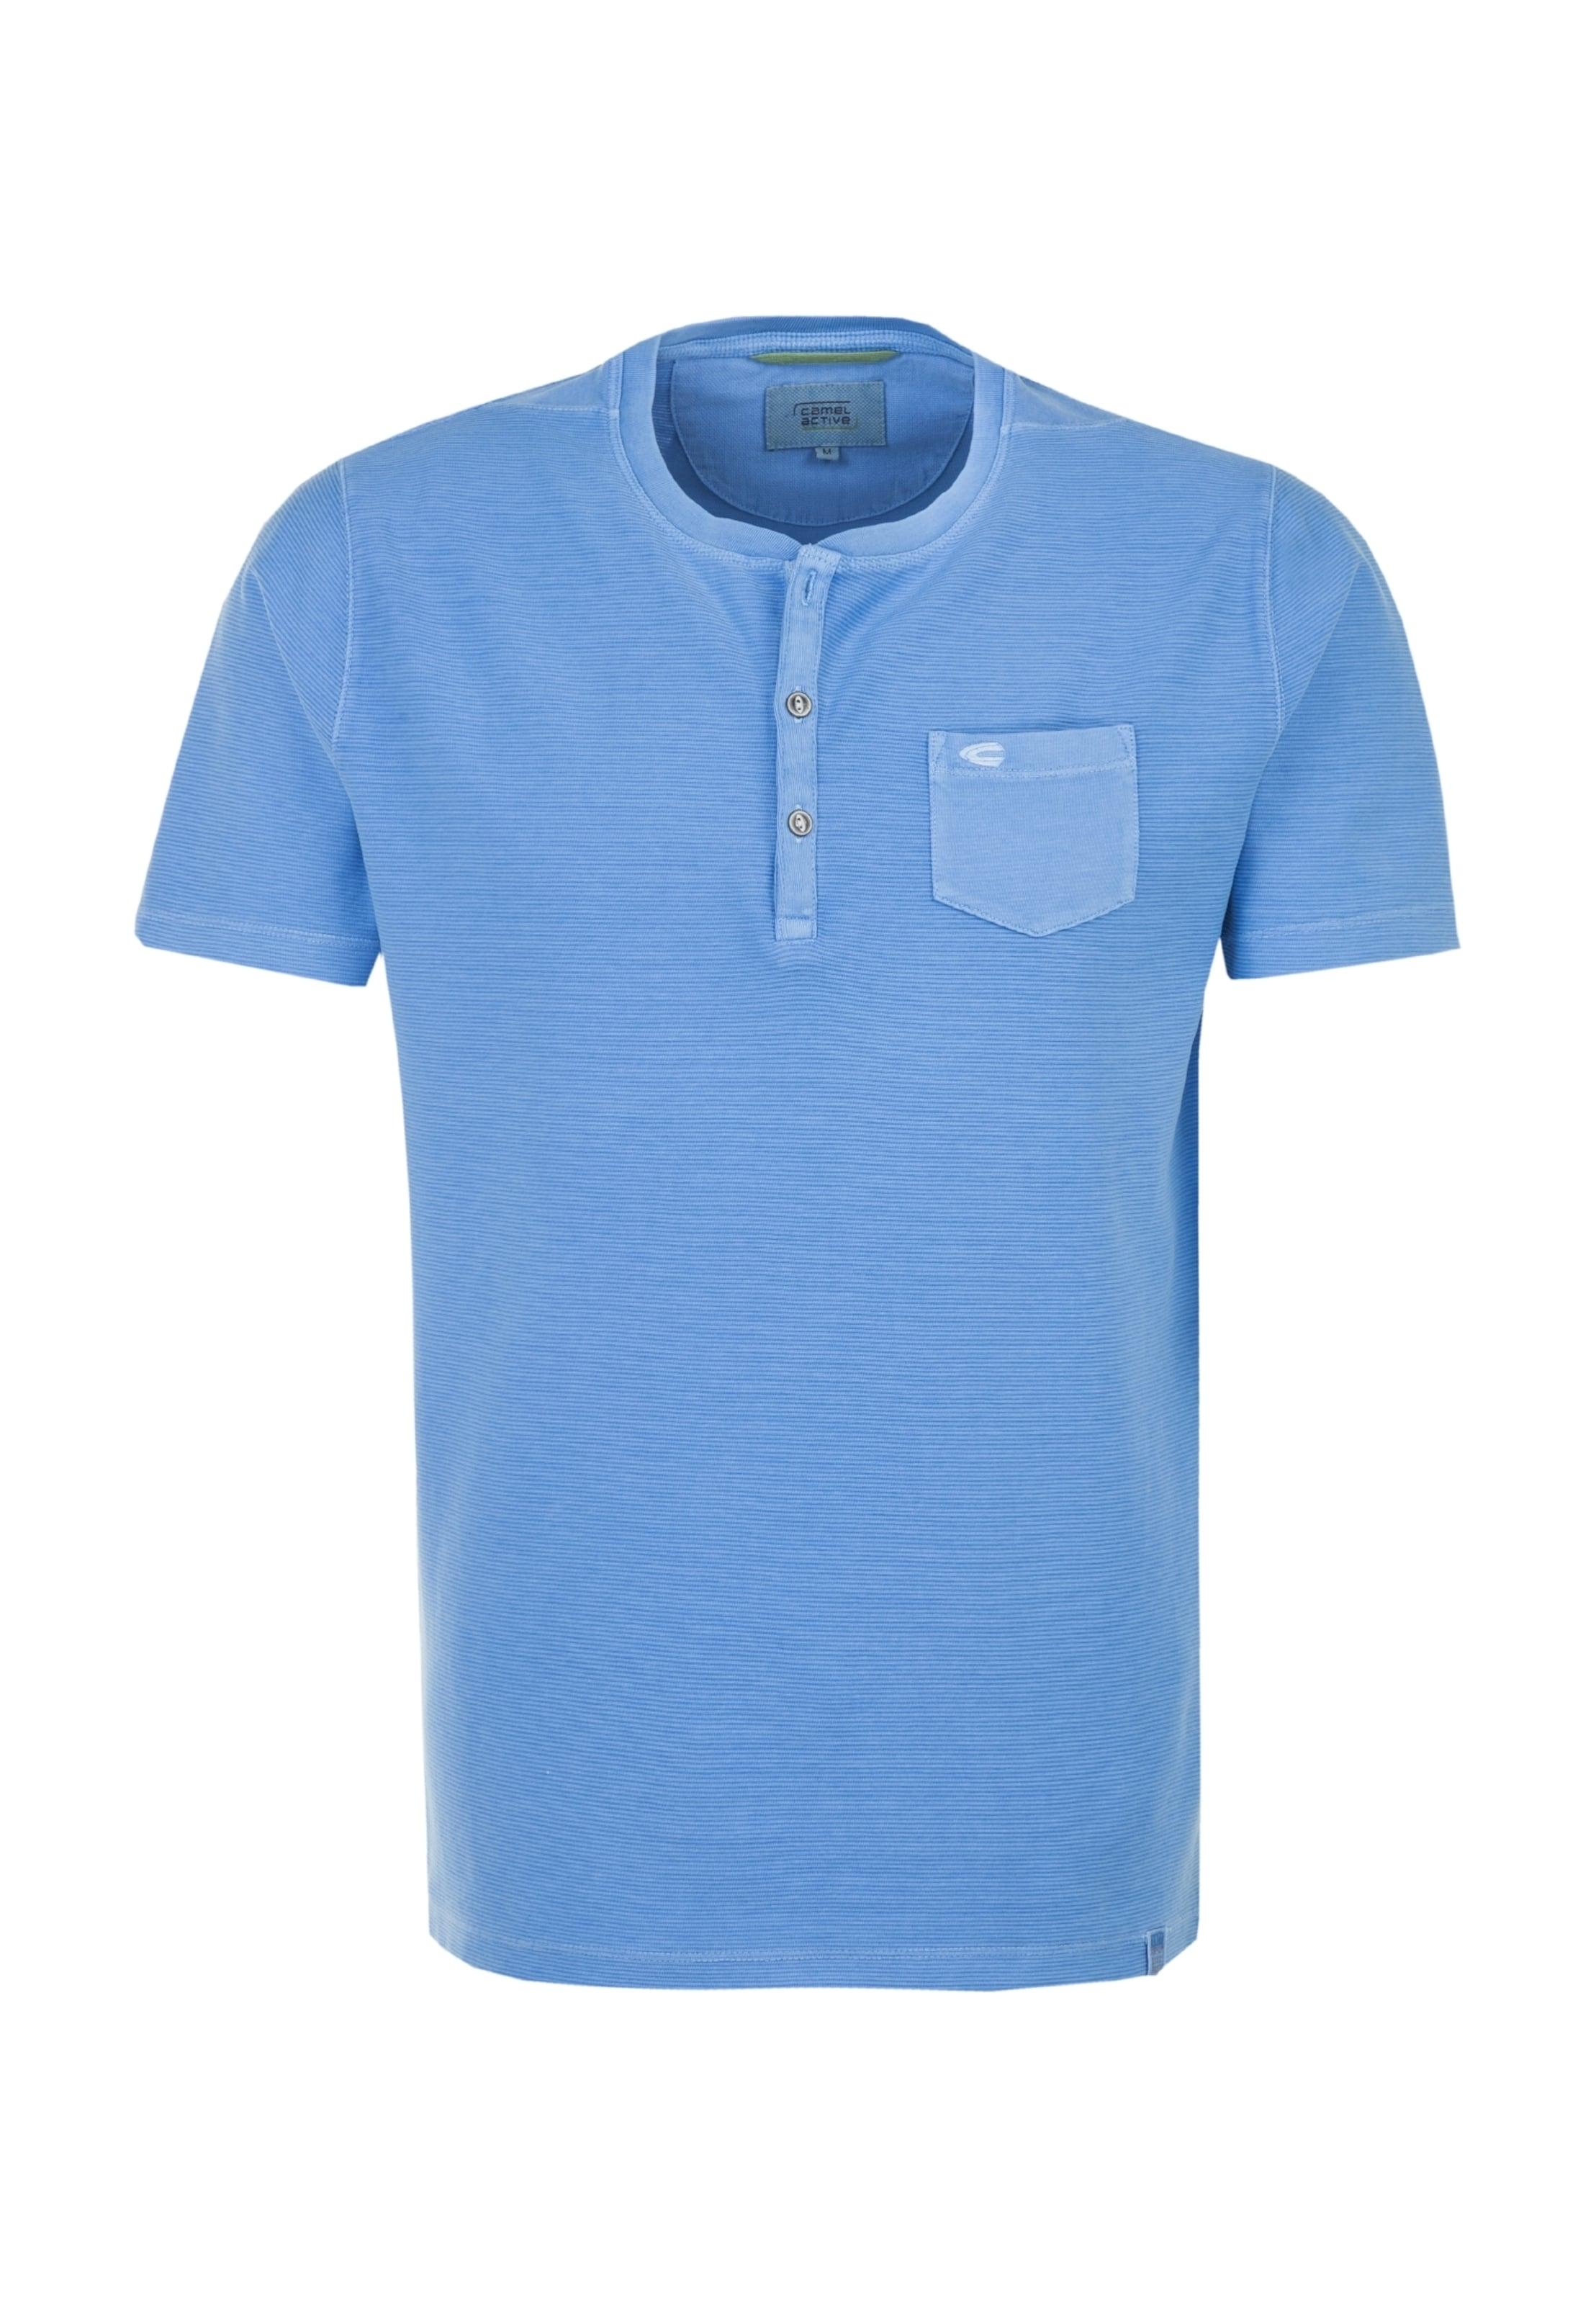 T Camel shirt In Active Blau Iv76Ybfgy